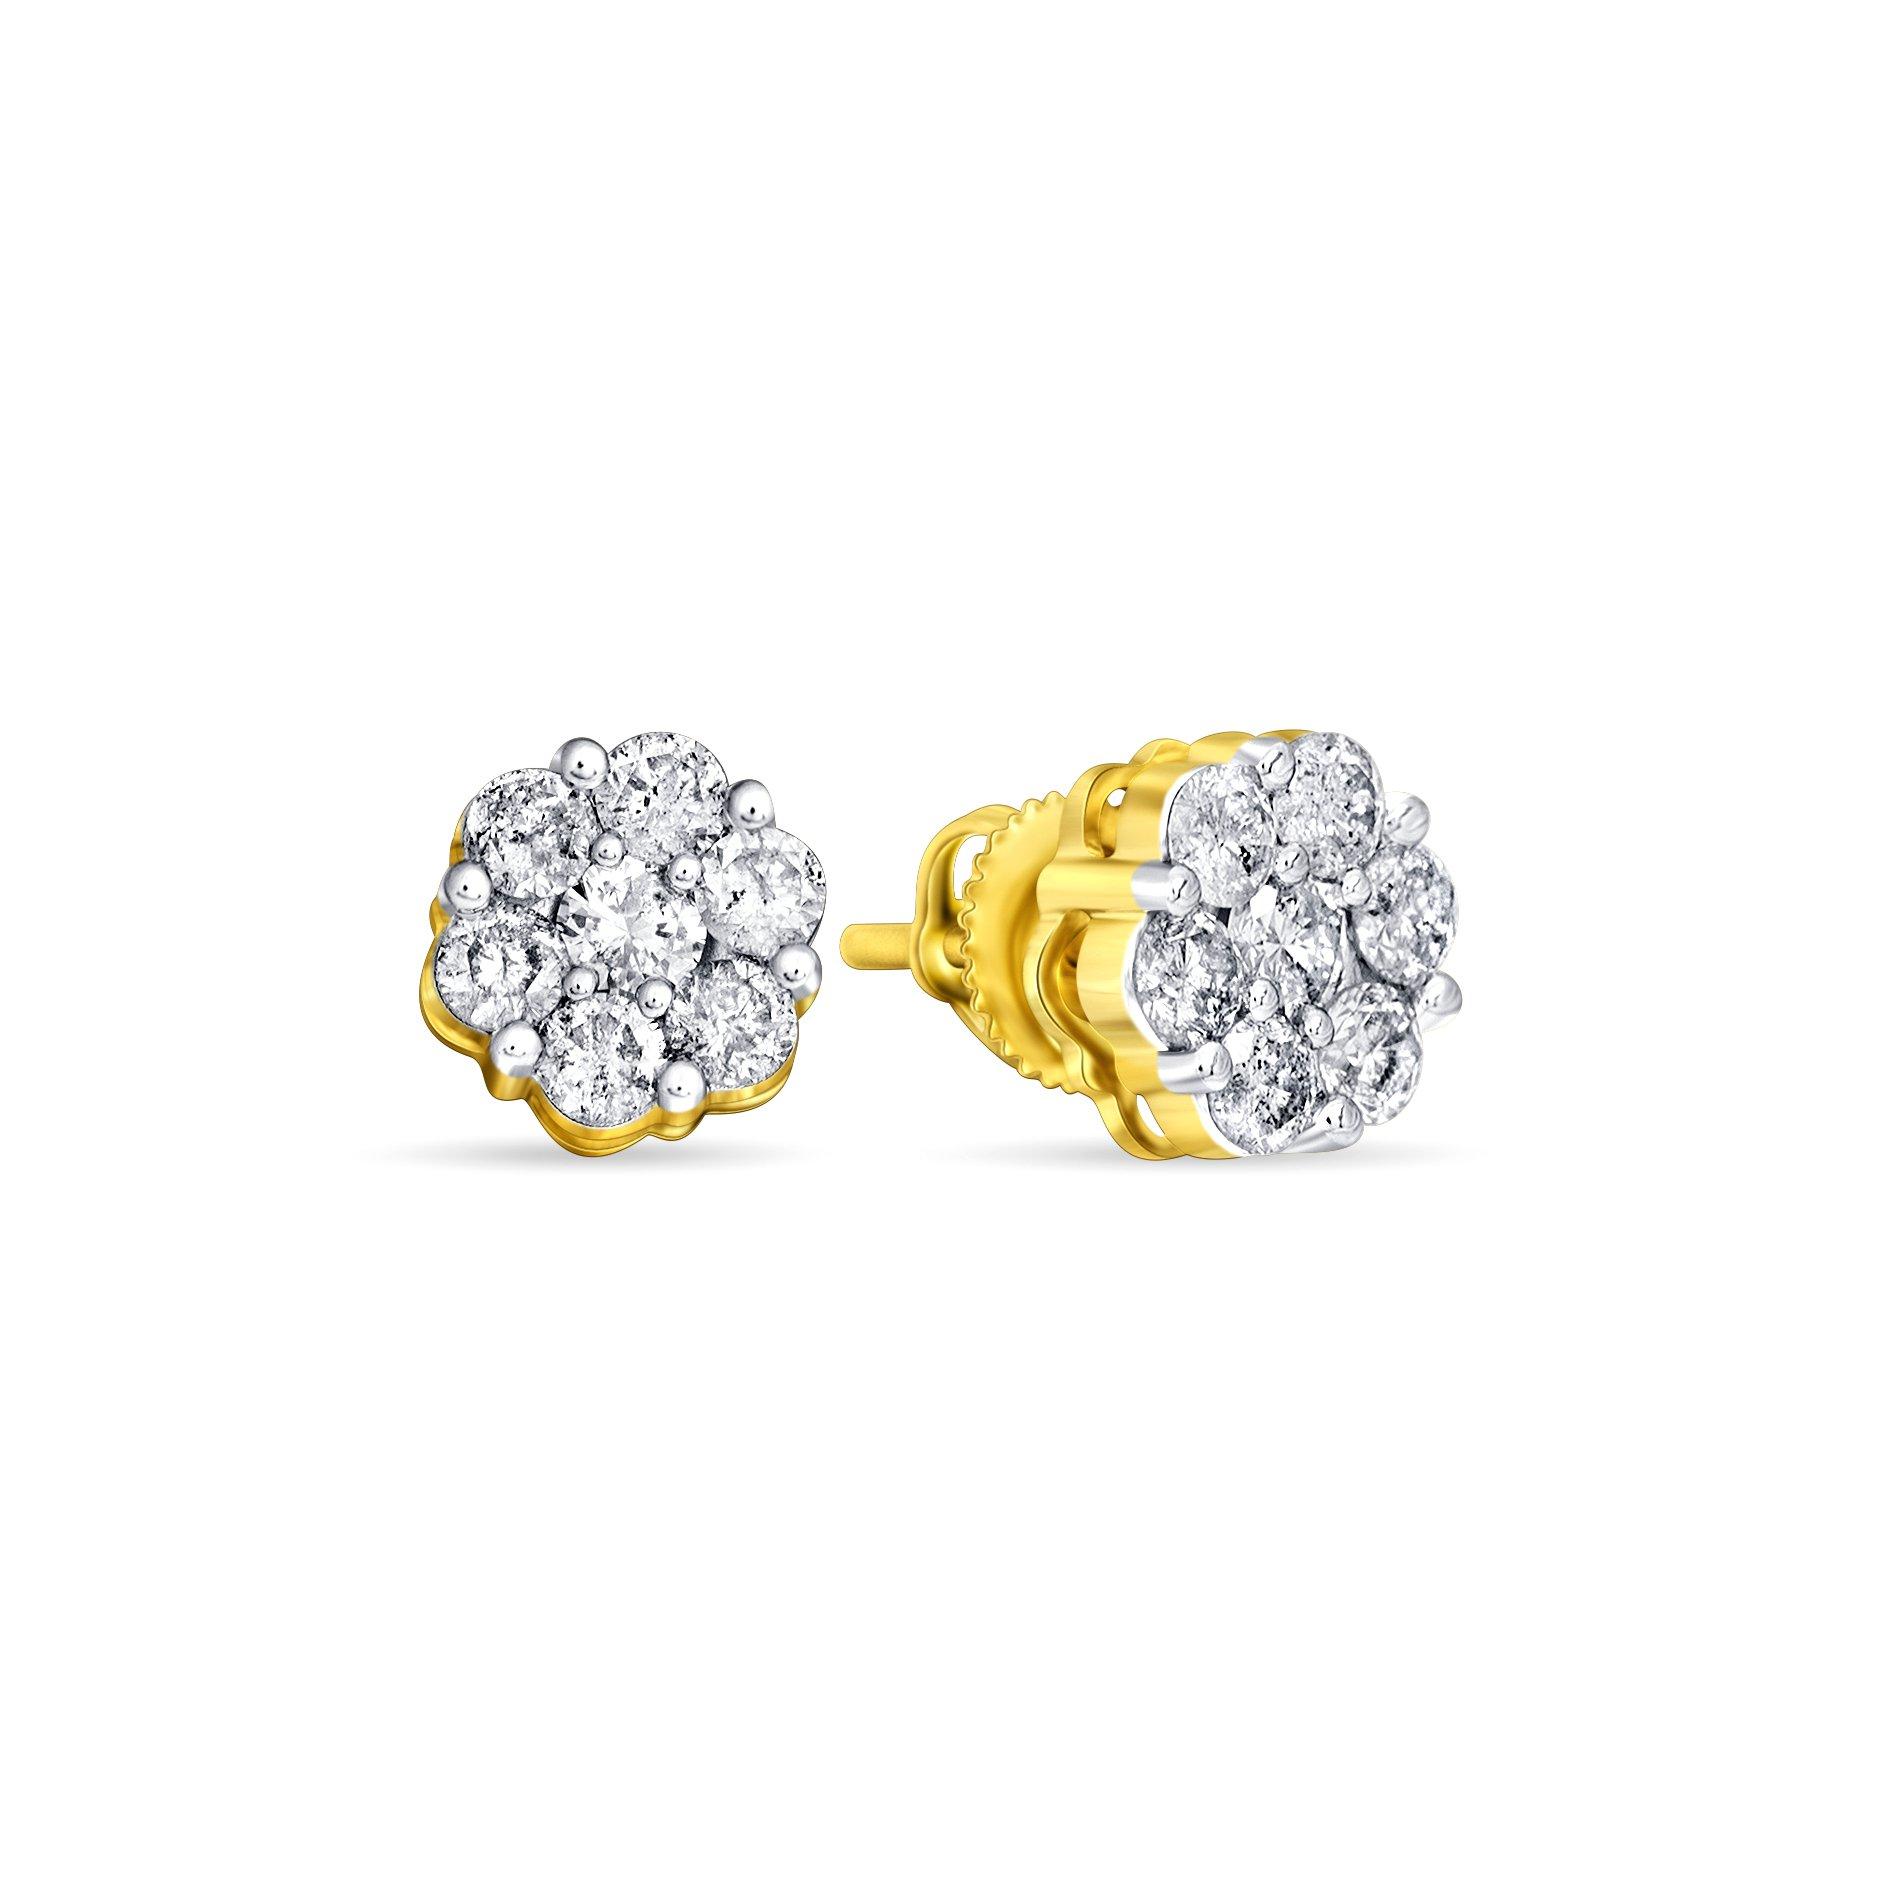 Royal, Rare, Jewel Ivy 10K Gold Diamond Earring Fine Jewelry, Best For Gifting Wife, Girlfriend, Friend